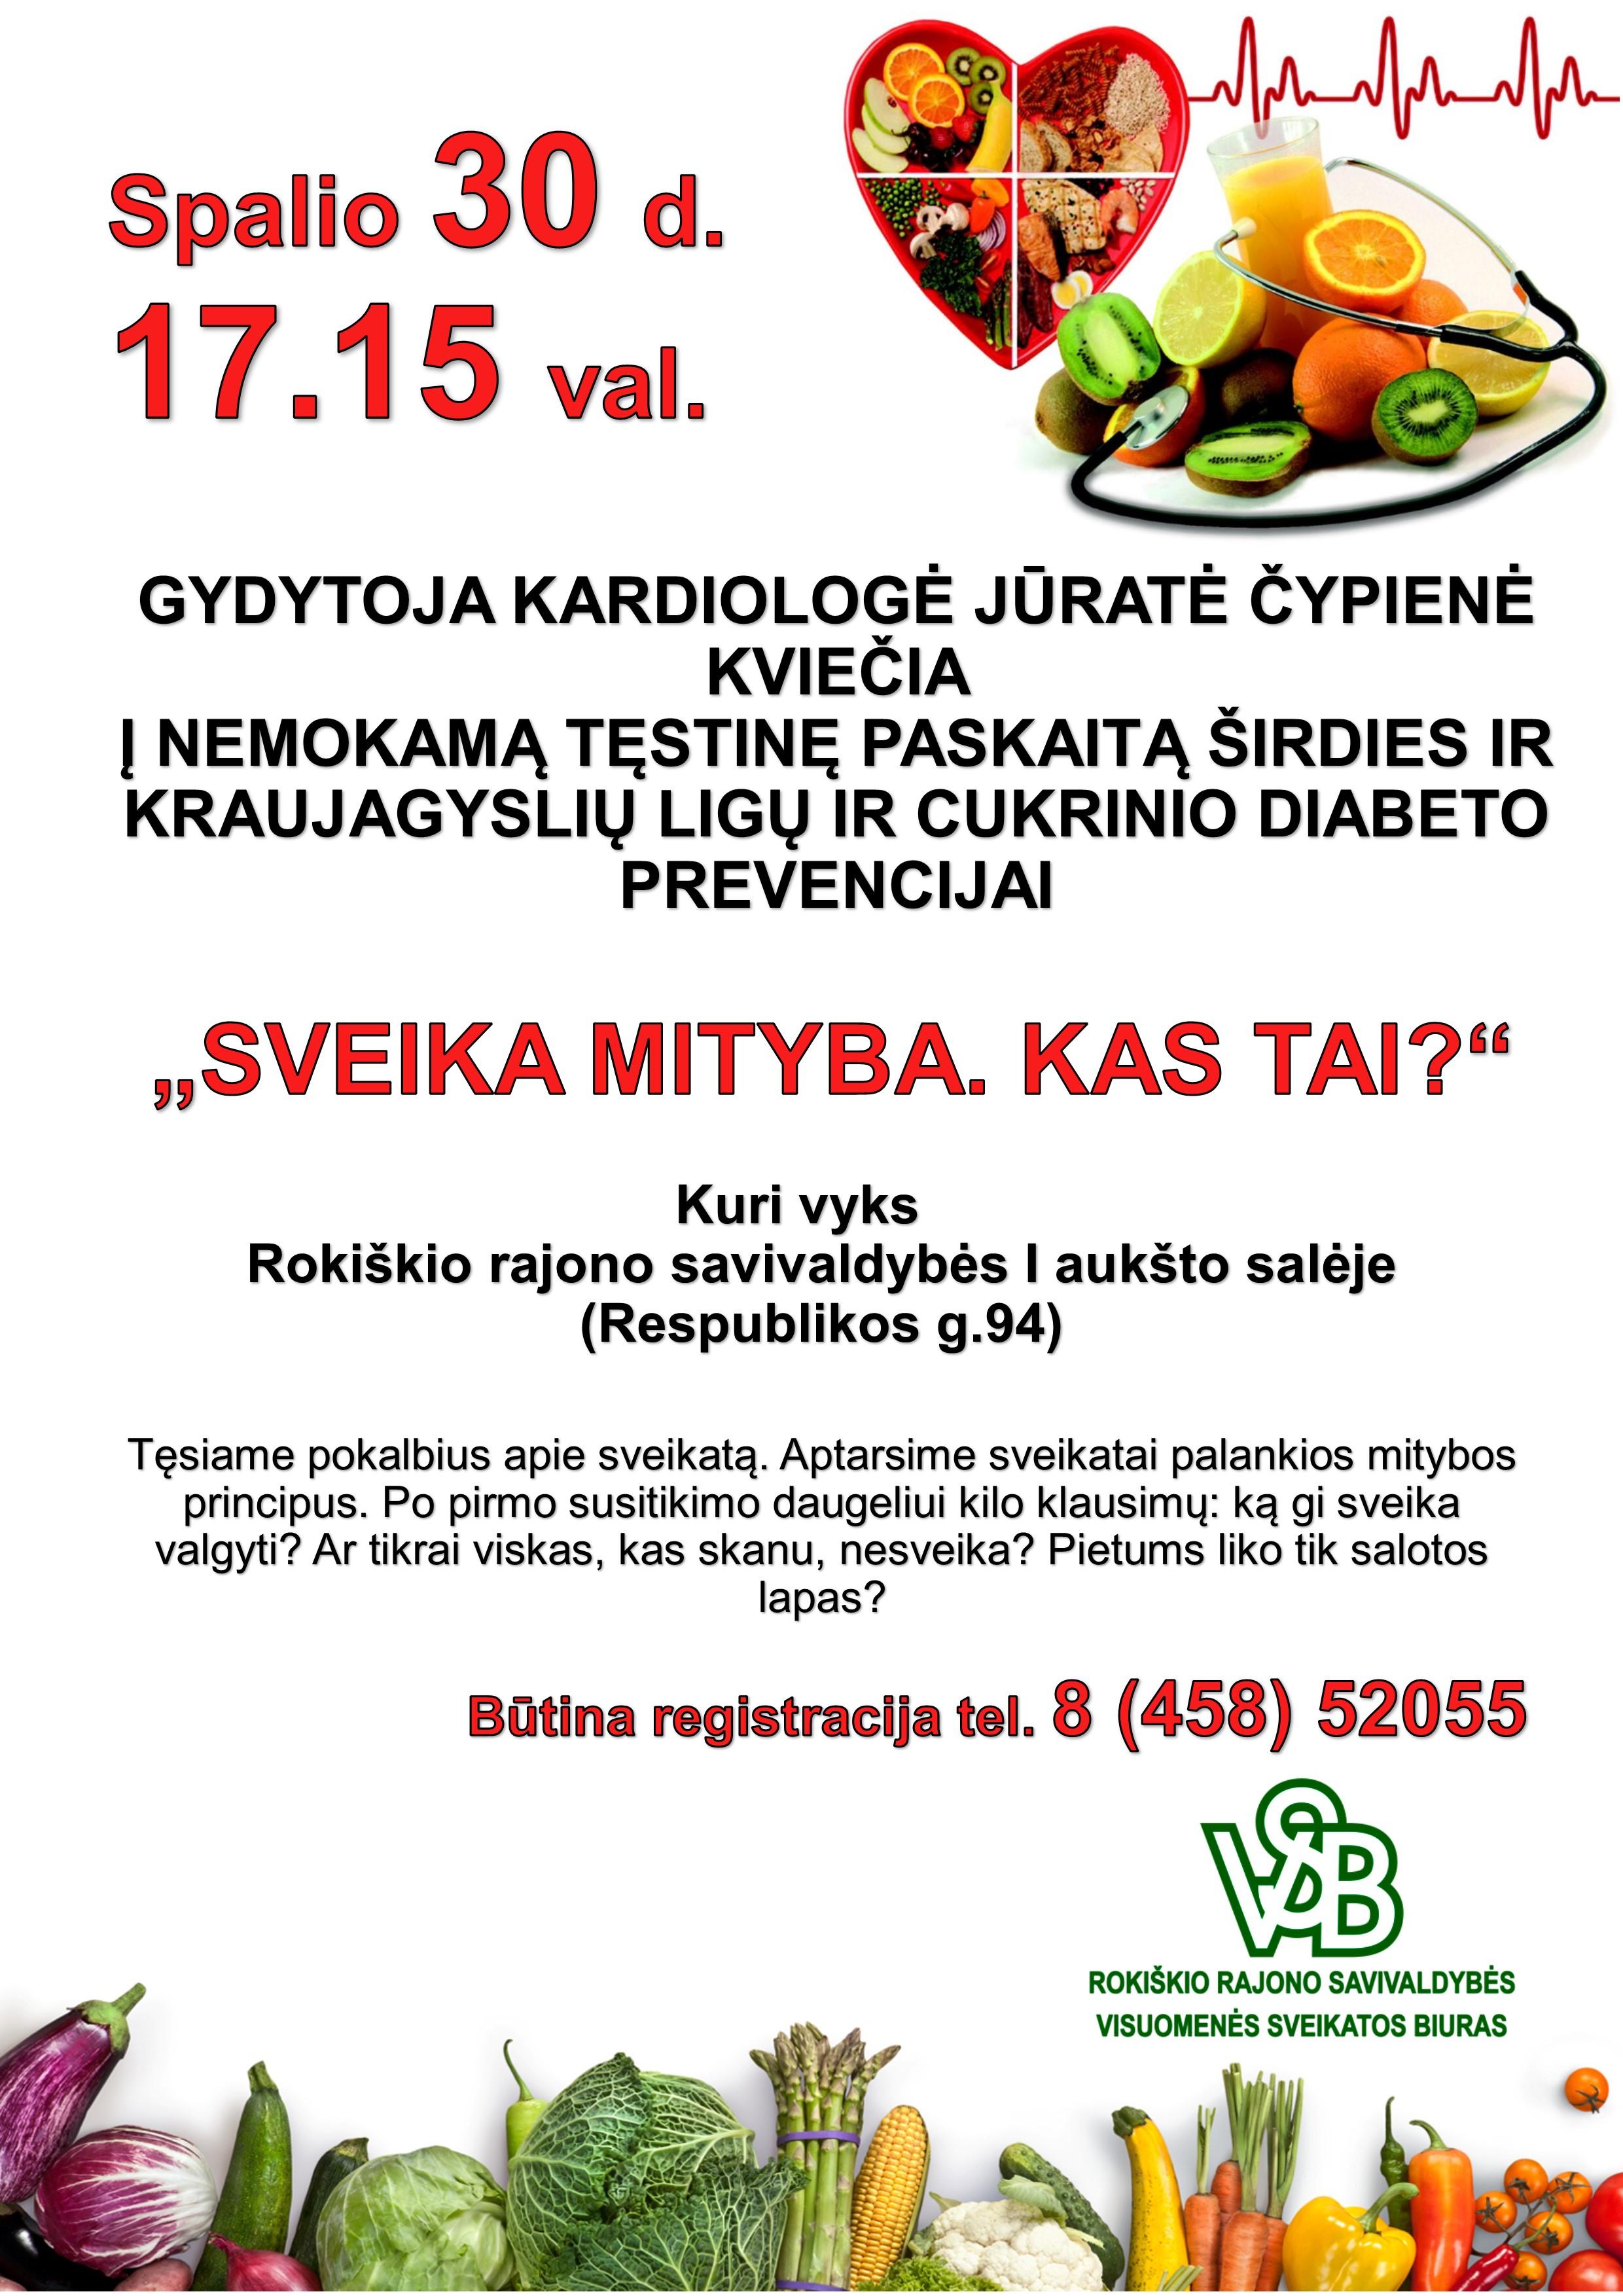 gera mityba širdies sveikatai mobilizacija ir hipertenzija